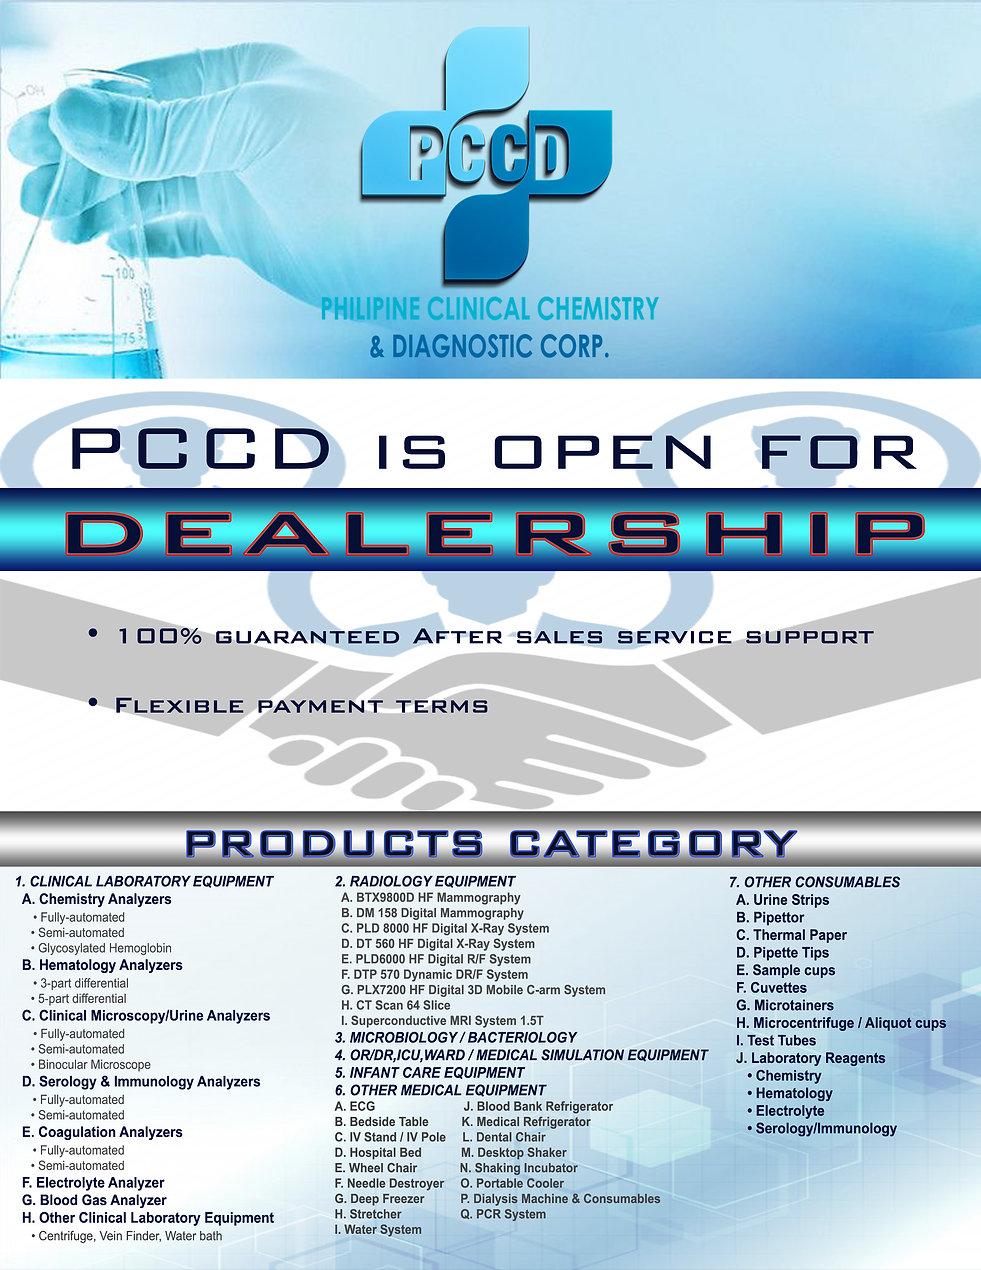 PCCD Dealer Flyer.jpg